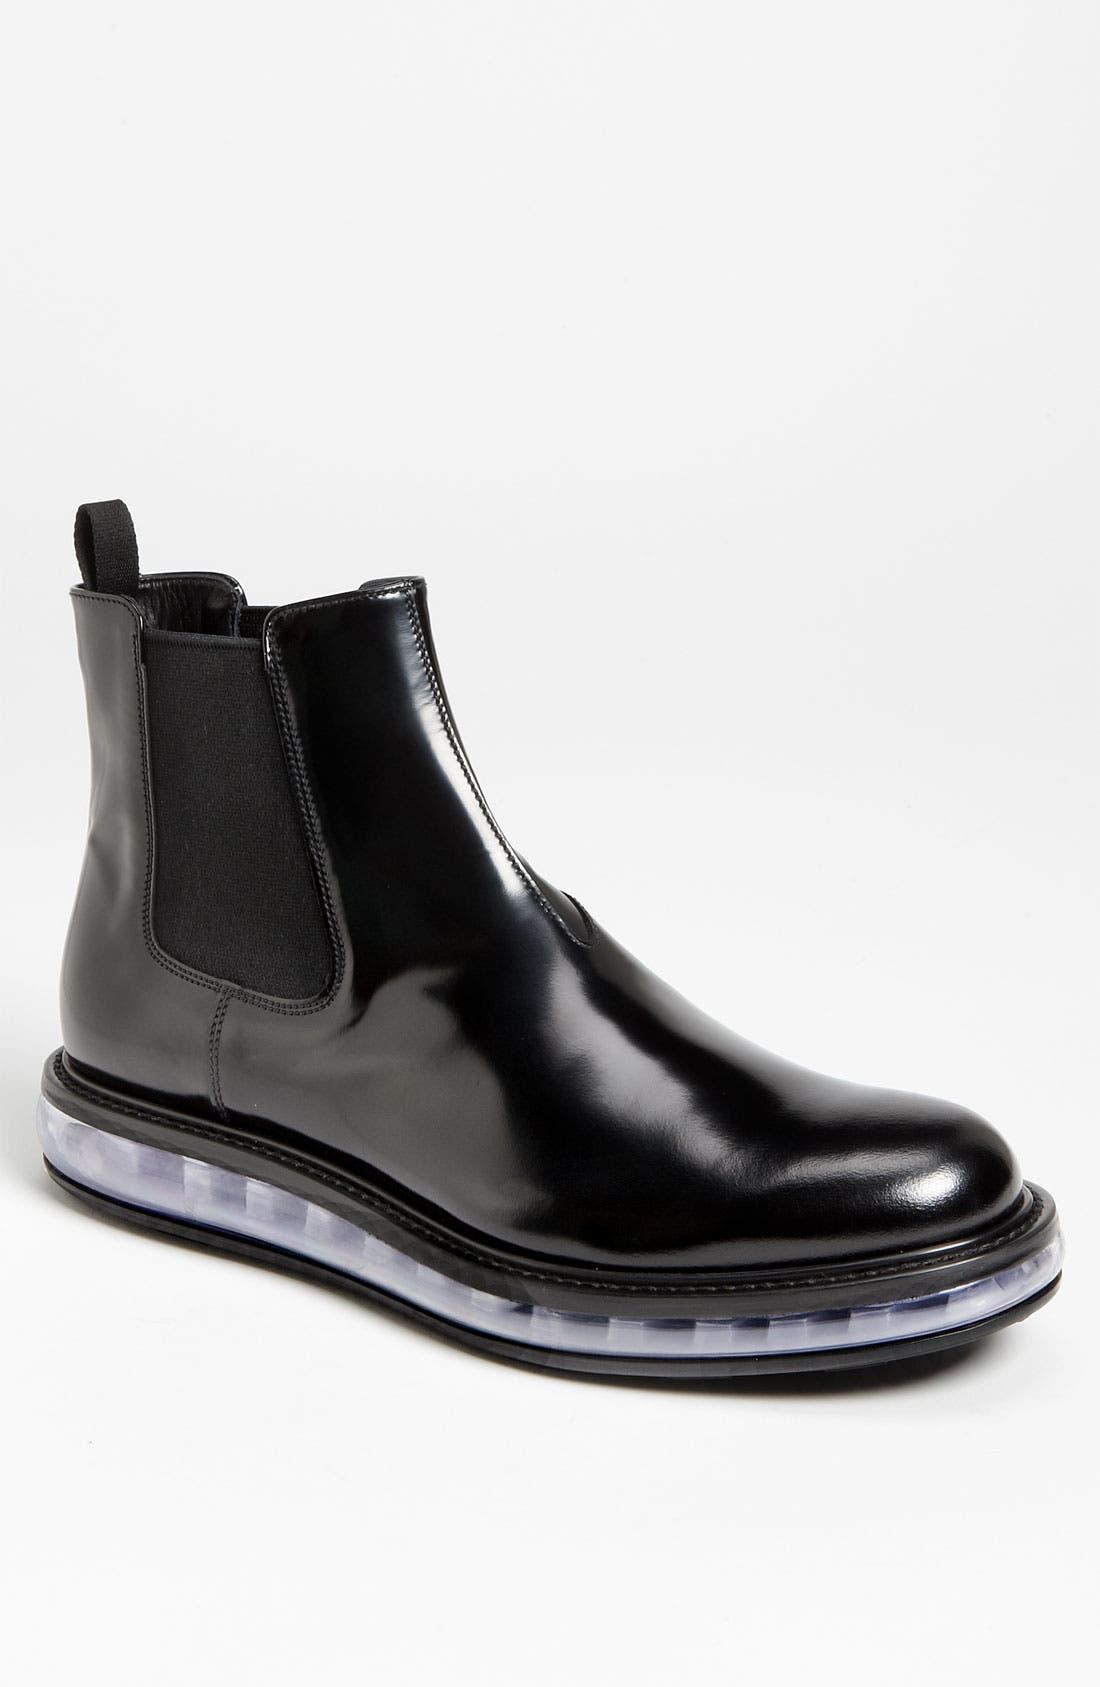 Main Image - Prada 'Levitate' Chelsea Boot